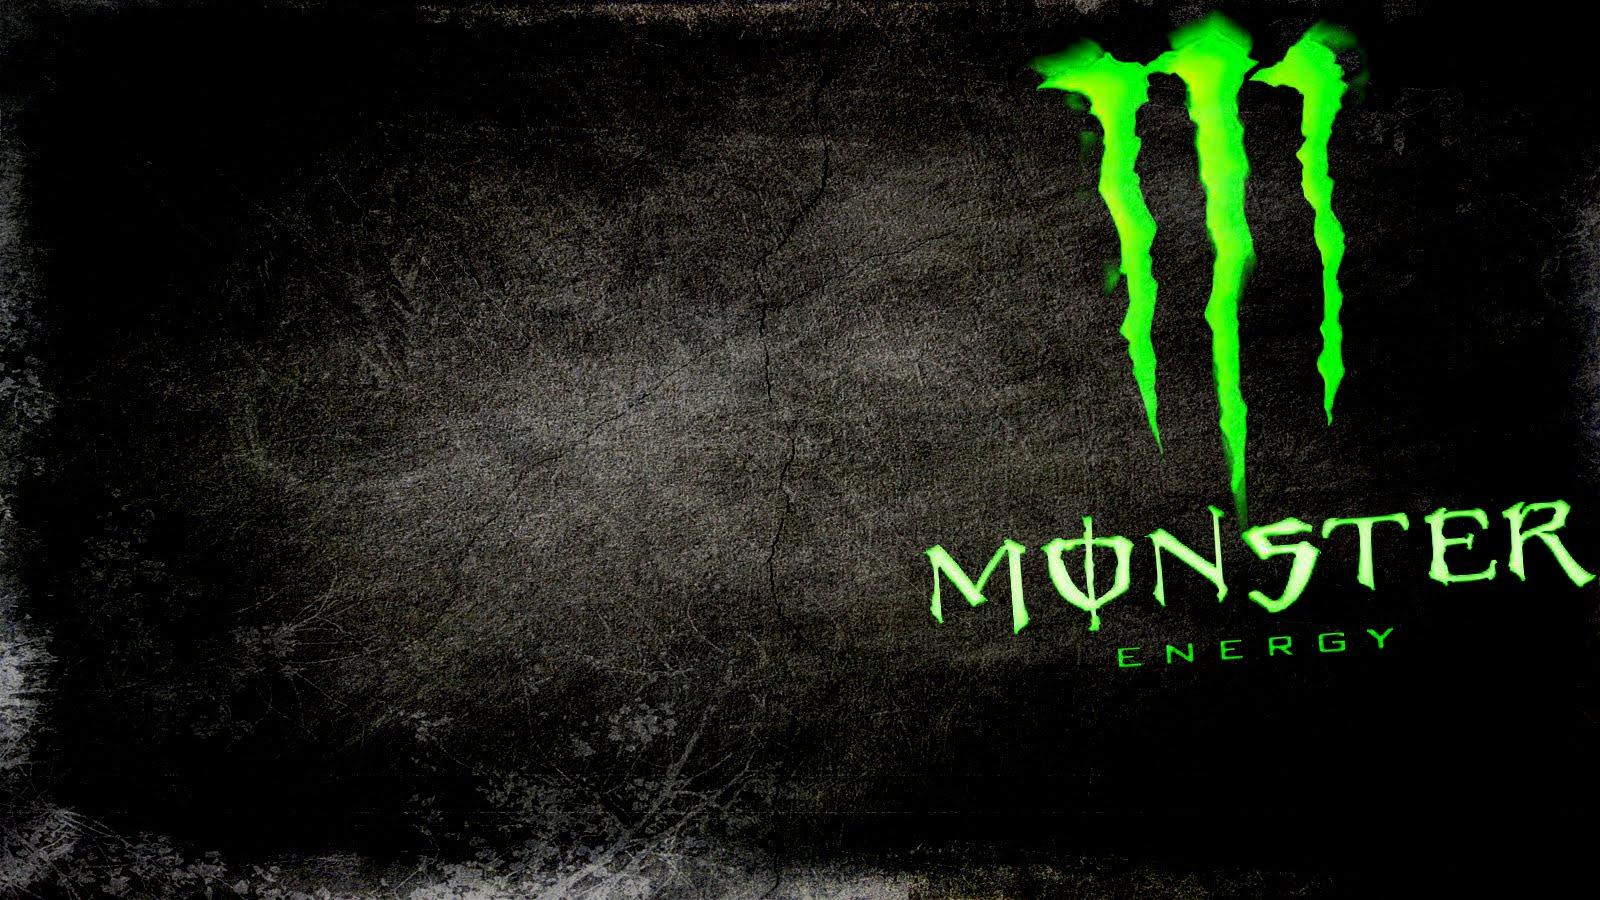 http://1.bp.blogspot.com/-VI1RFj6JJ9o/T1ksT6emVSI/AAAAAAAAGJo/g5FKzpWbIfU/s1600/Monster%2BEnergy%2Bd05.jpg